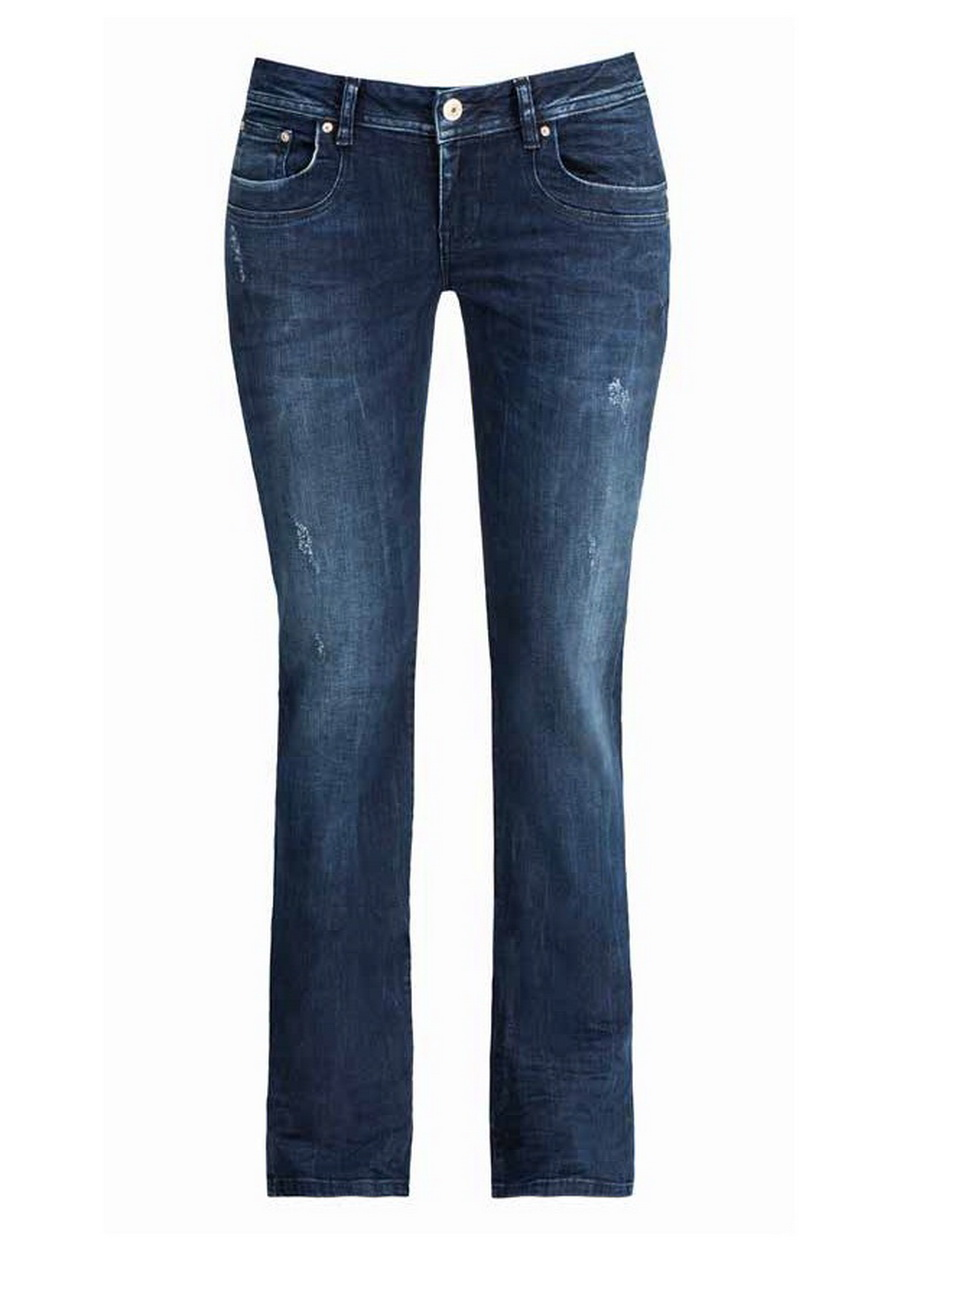 ltb damen jeans valerie bootcut blau hilla wash kaufen jeans direct de. Black Bedroom Furniture Sets. Home Design Ideas